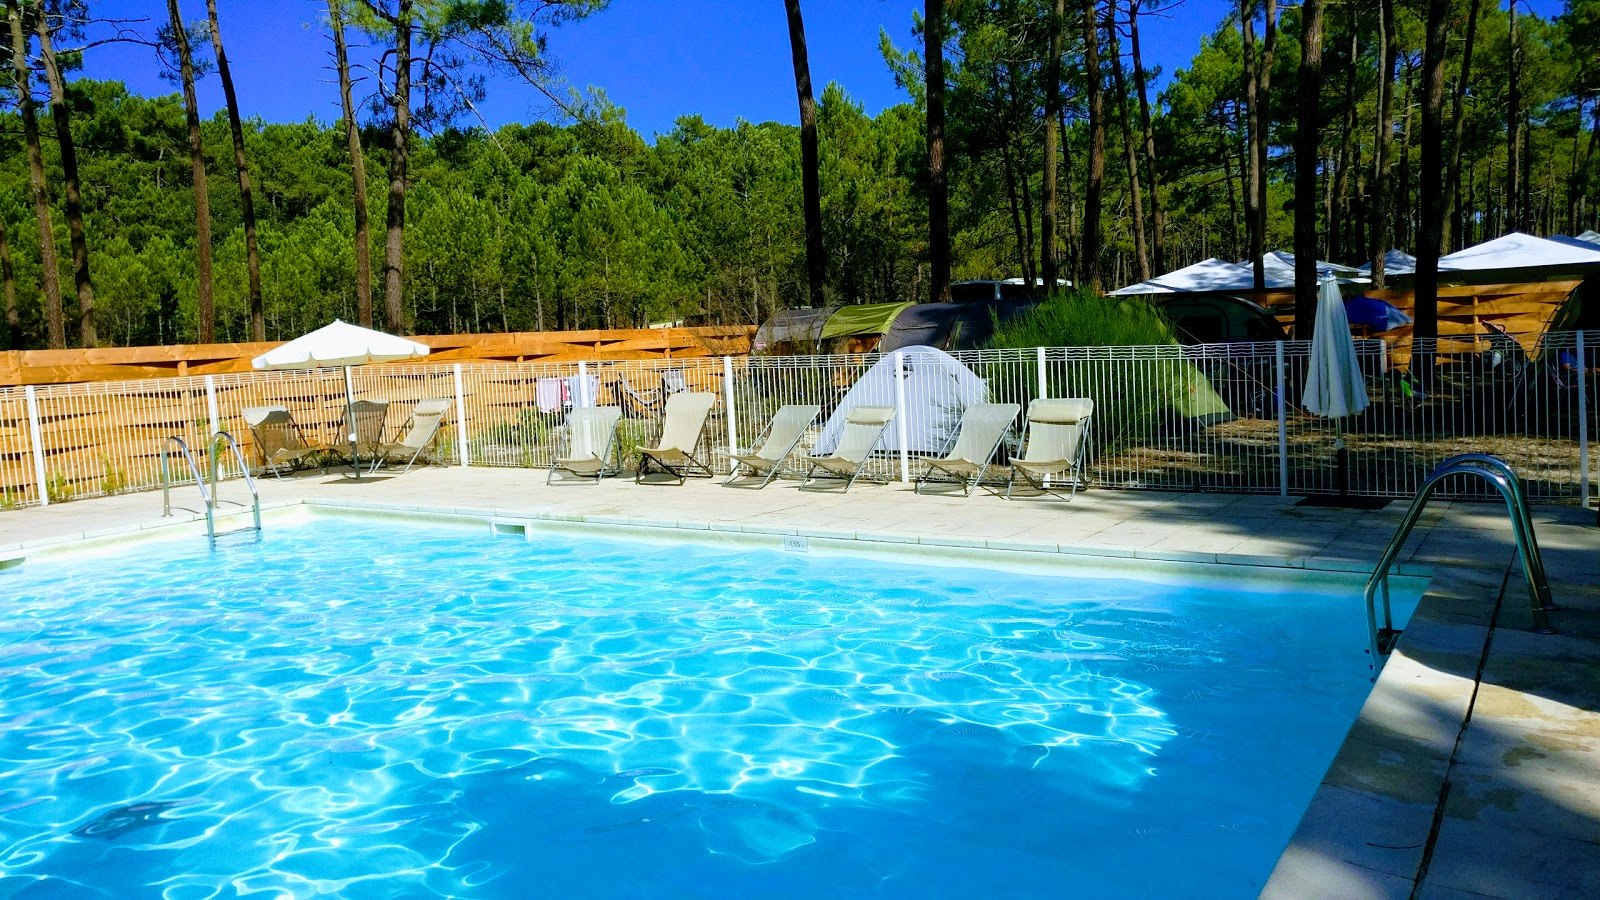 Camping huttopia lac de carcans tripcarta for Camping lac aiguebelette avec piscine